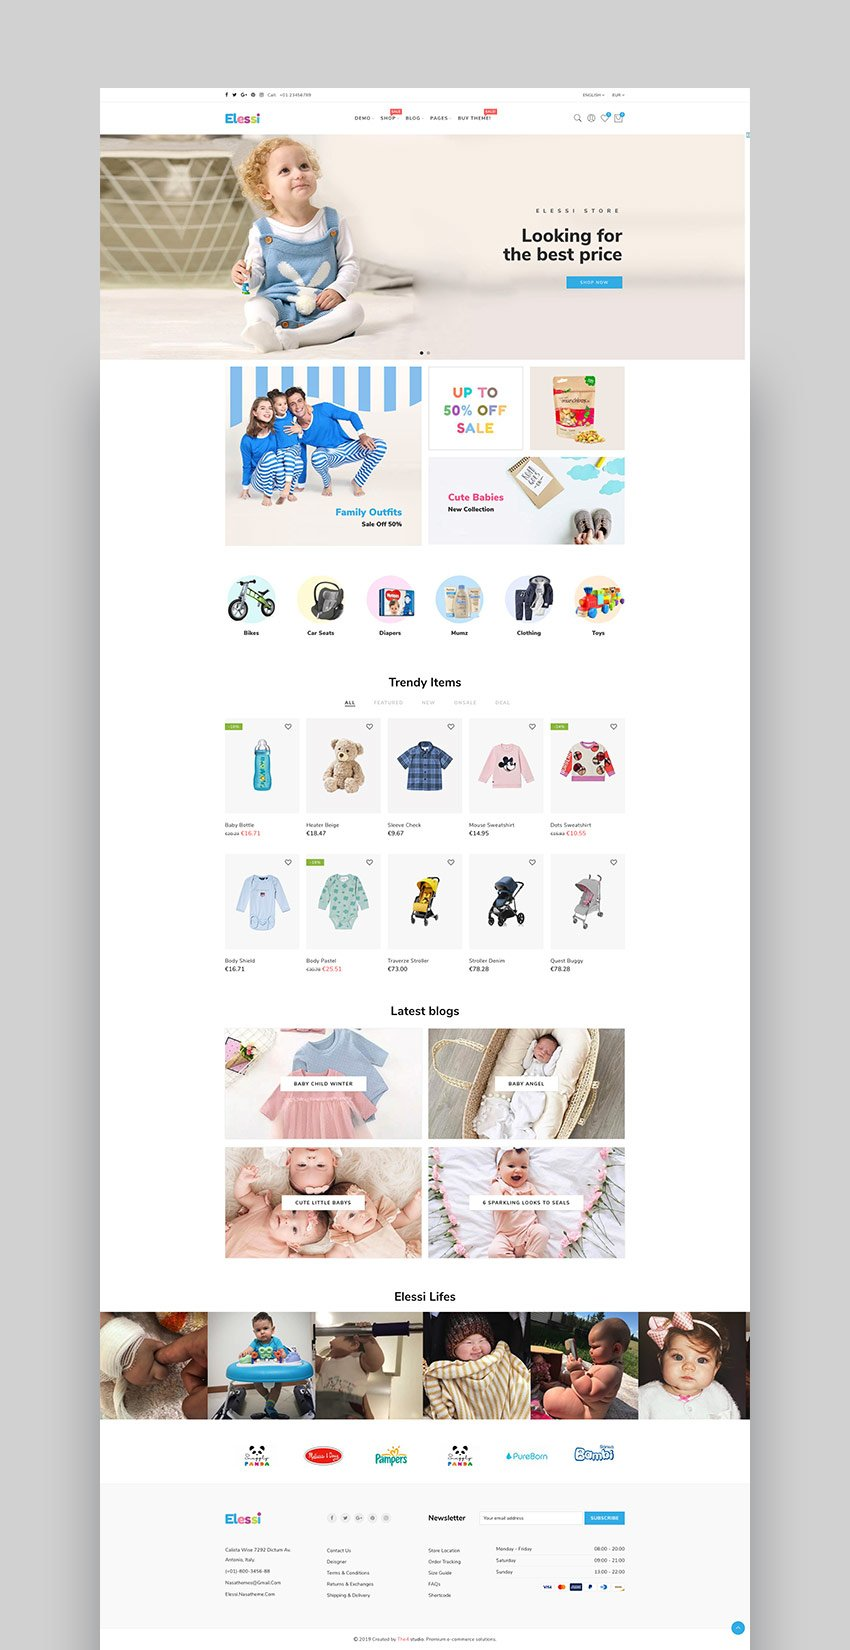 Elessi - Shopify Themes 2019